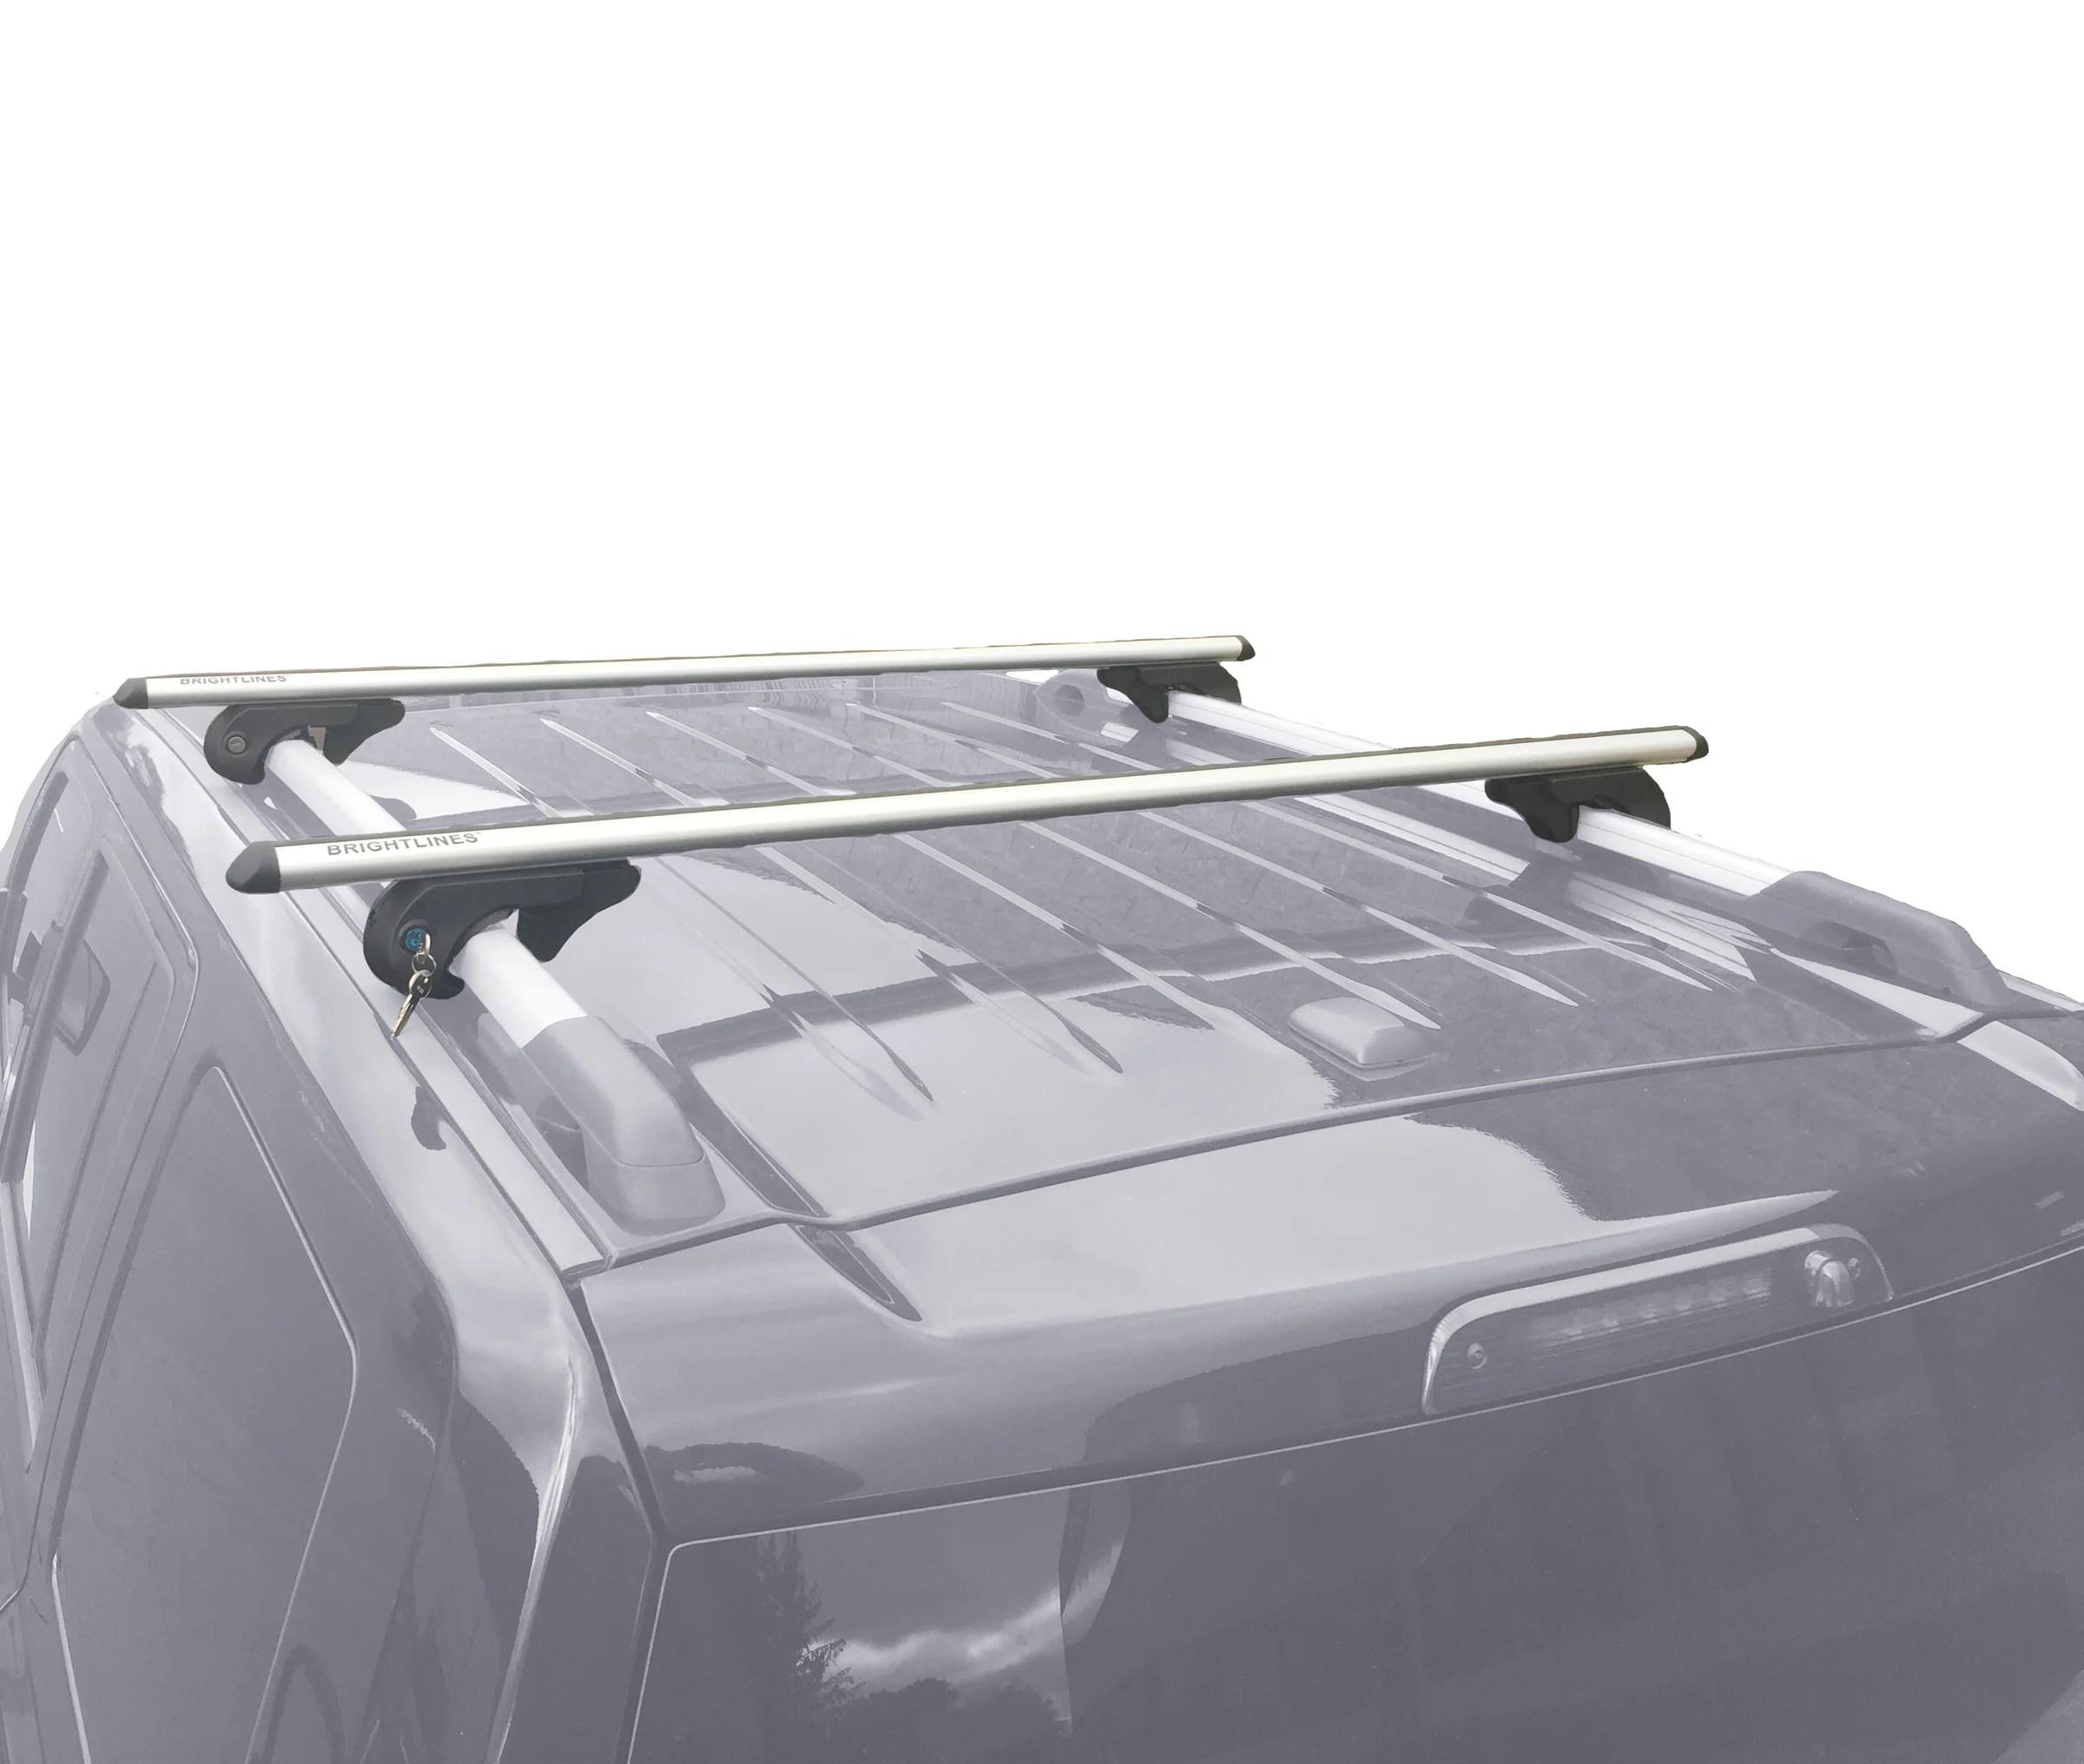 small resolution of brightlines hyundai tucson roof rack crossbars 2004 2015 asg auto sports